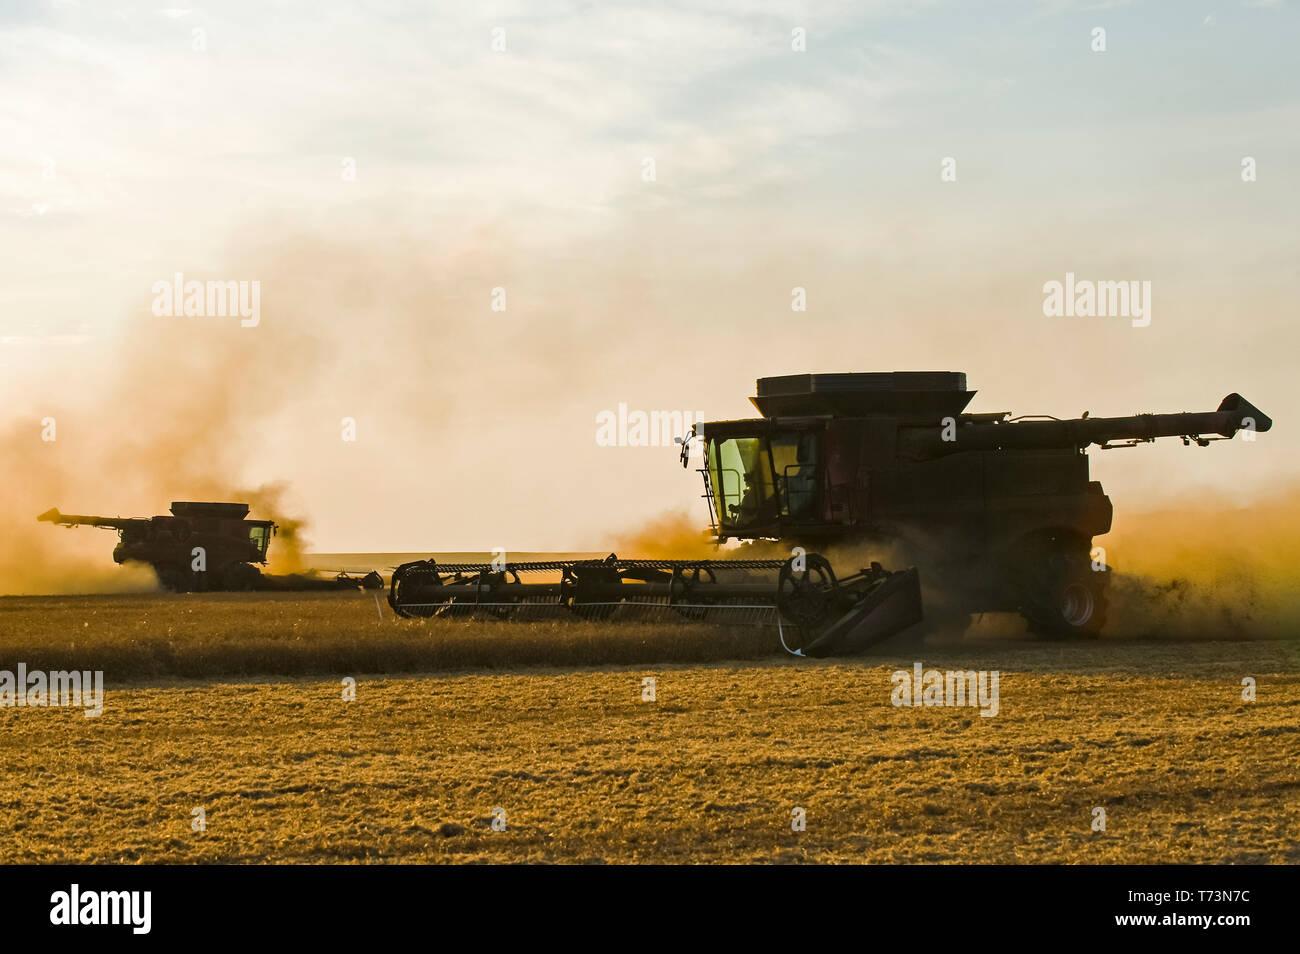 A combine harvester works in a yellow field pea field, near Winnipeg; Manitoba, Canada Stock Photo